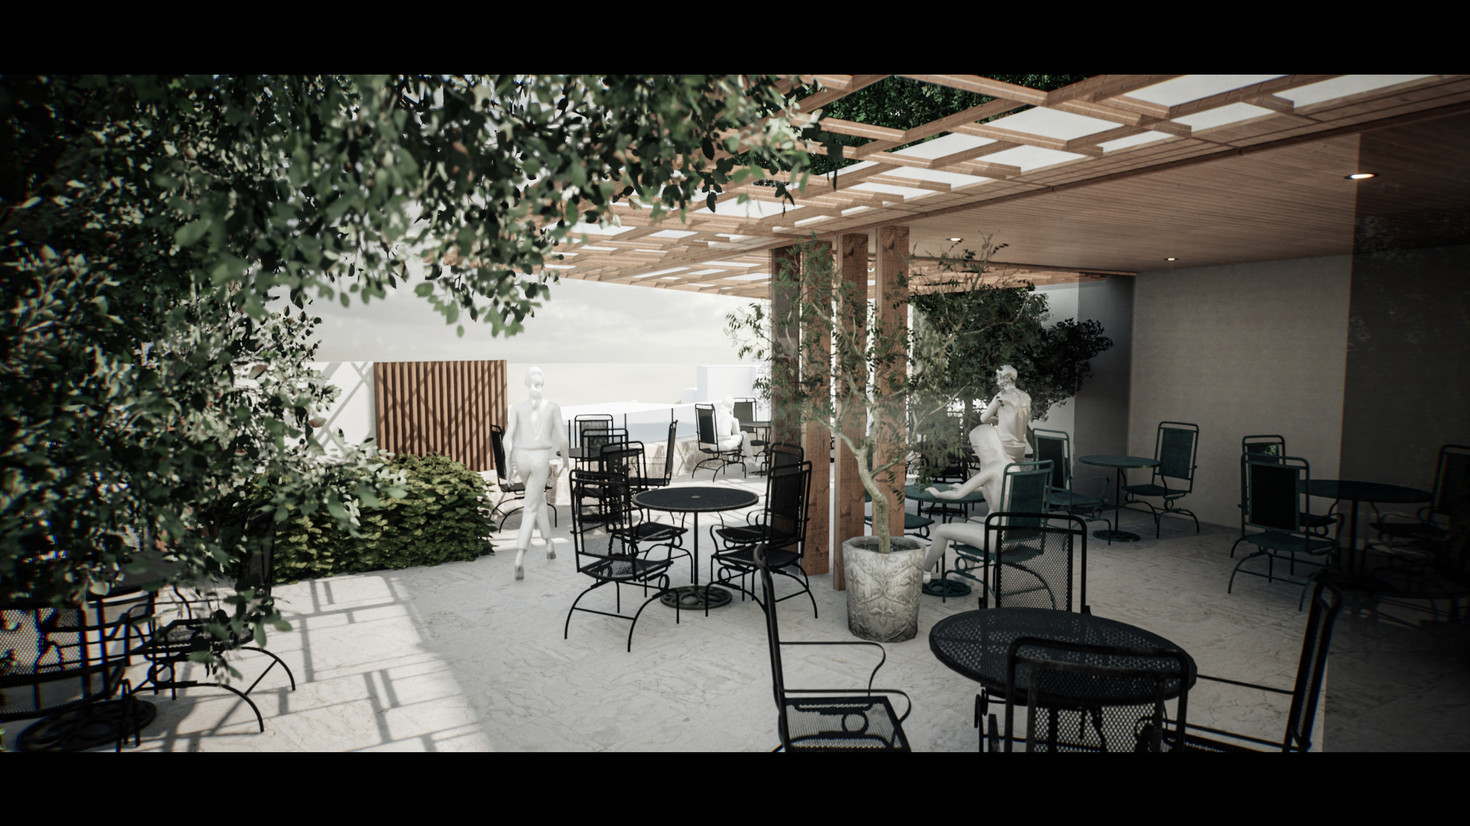 Central courtyard 2